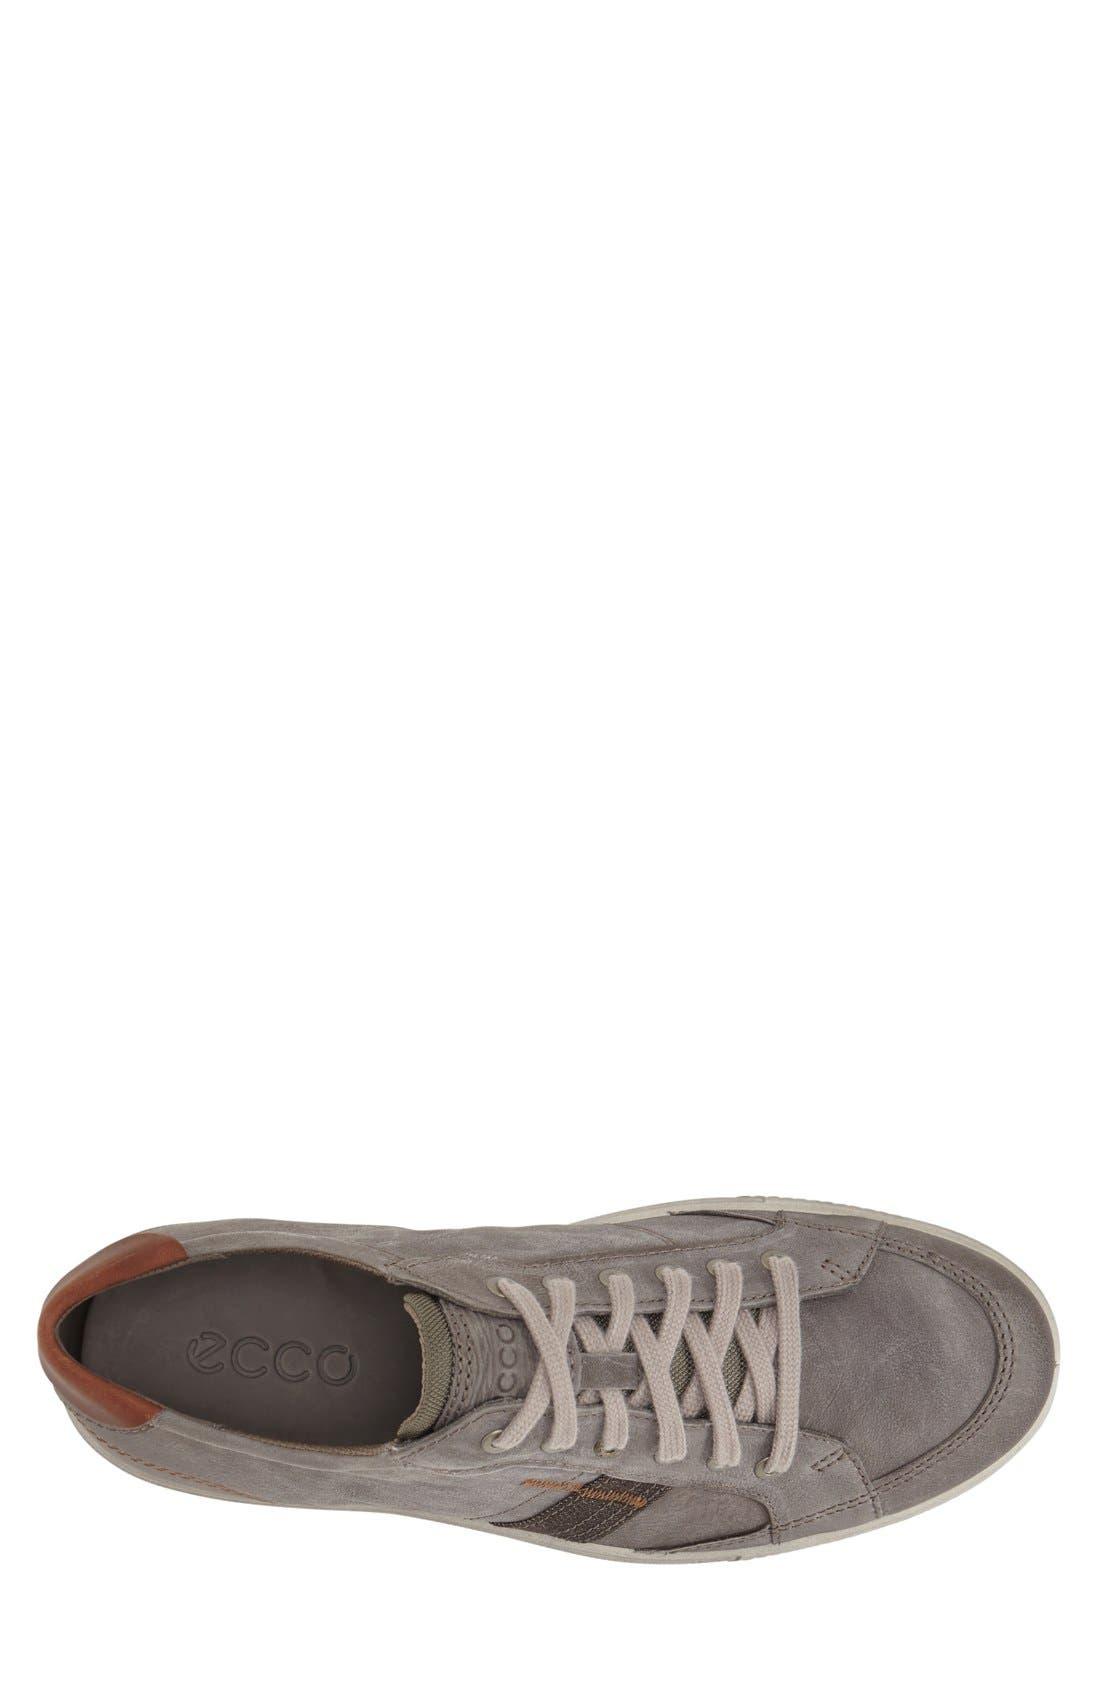 Alternate Image 3  - ECCO 'Ennio Retro' Sneaker (Men)